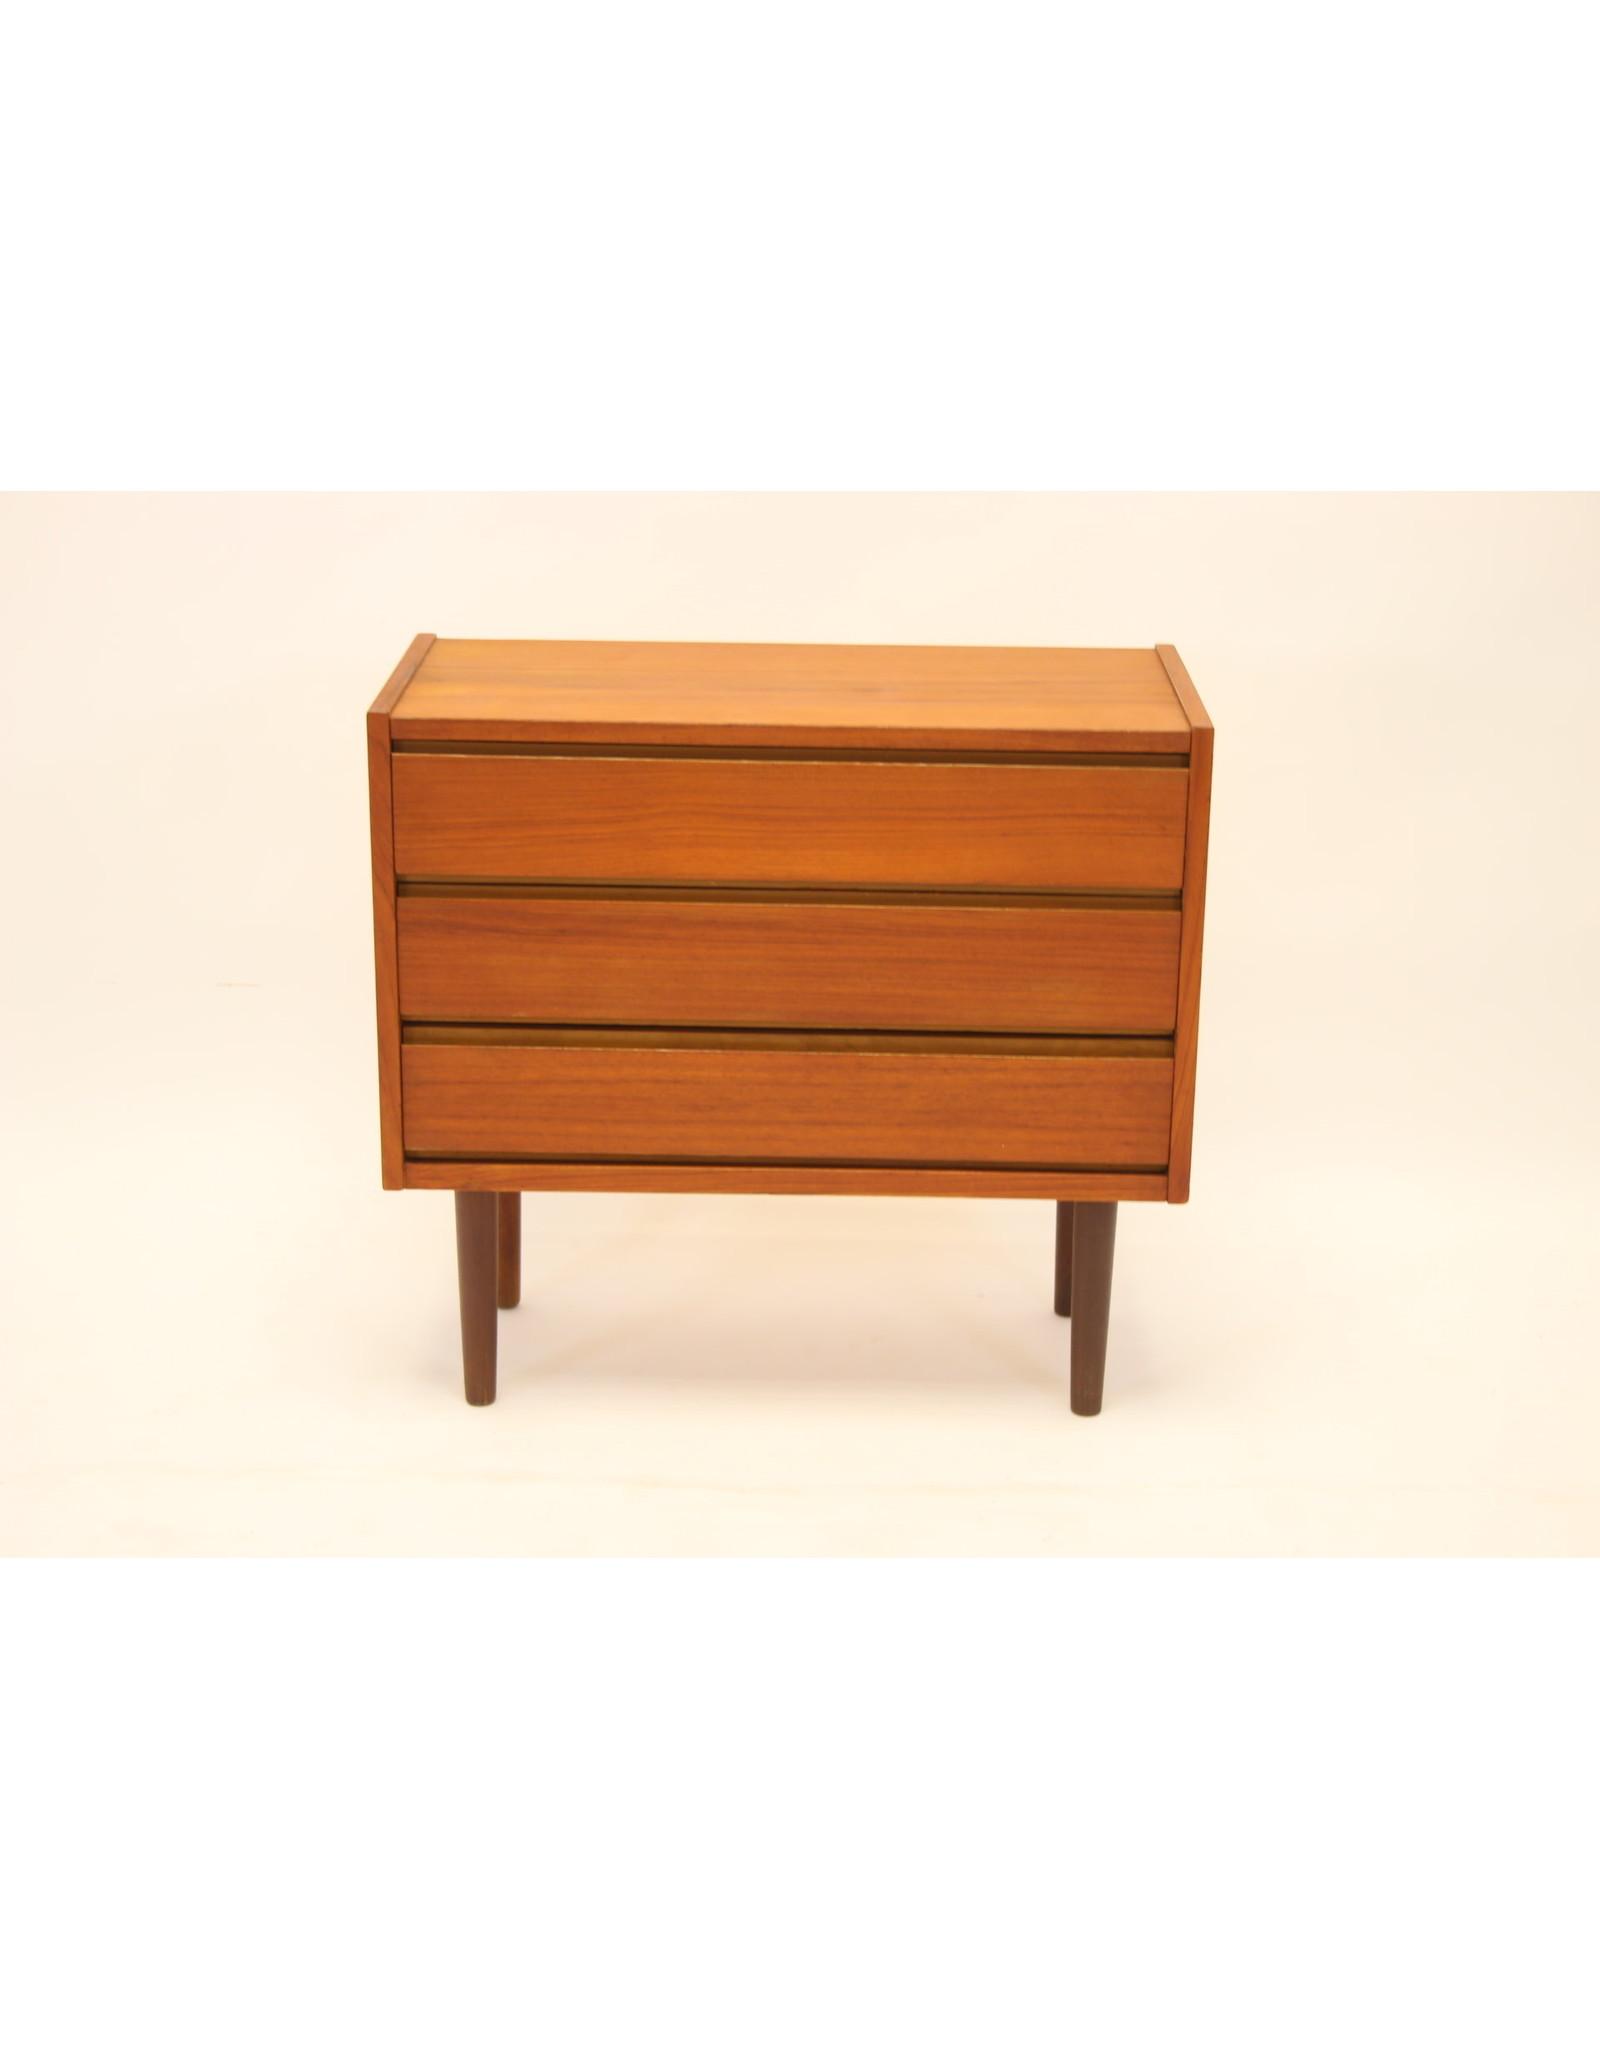 Deens Teak drie lades sideboard 1960's